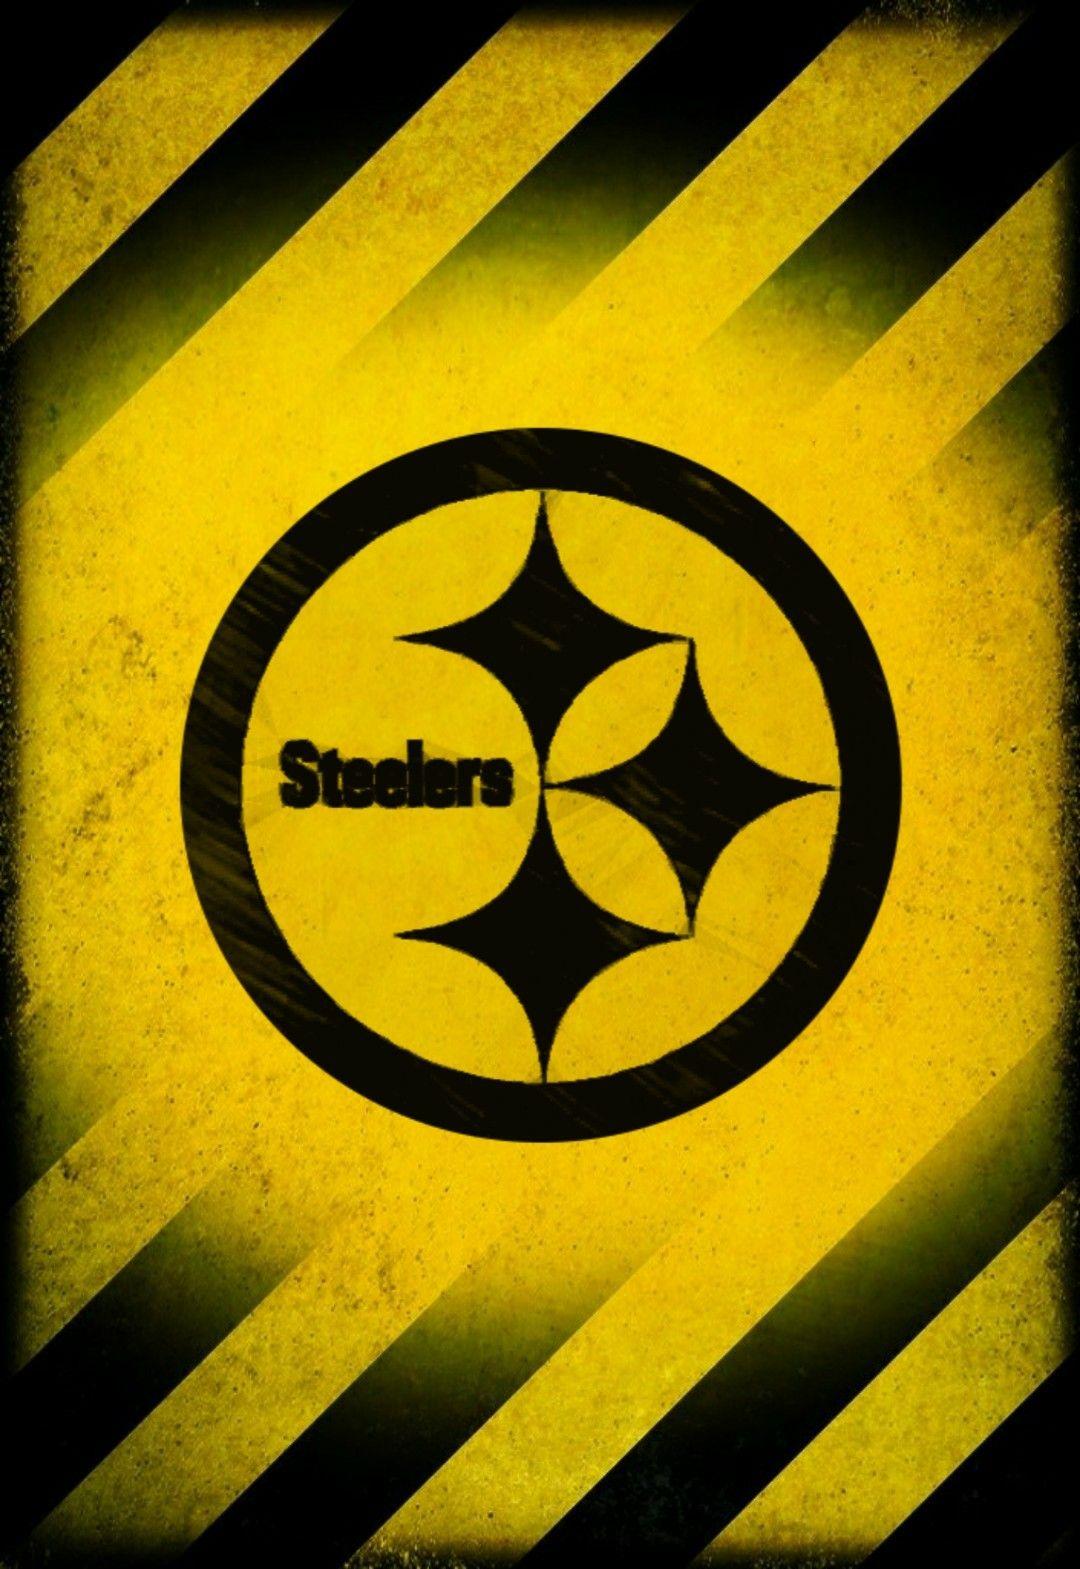 Pittsburgh Steelers Logo Wallpaper Pittsburgh Steelers Wallpaper Pittsburg Steelers Pittsburgh Steelers Logo